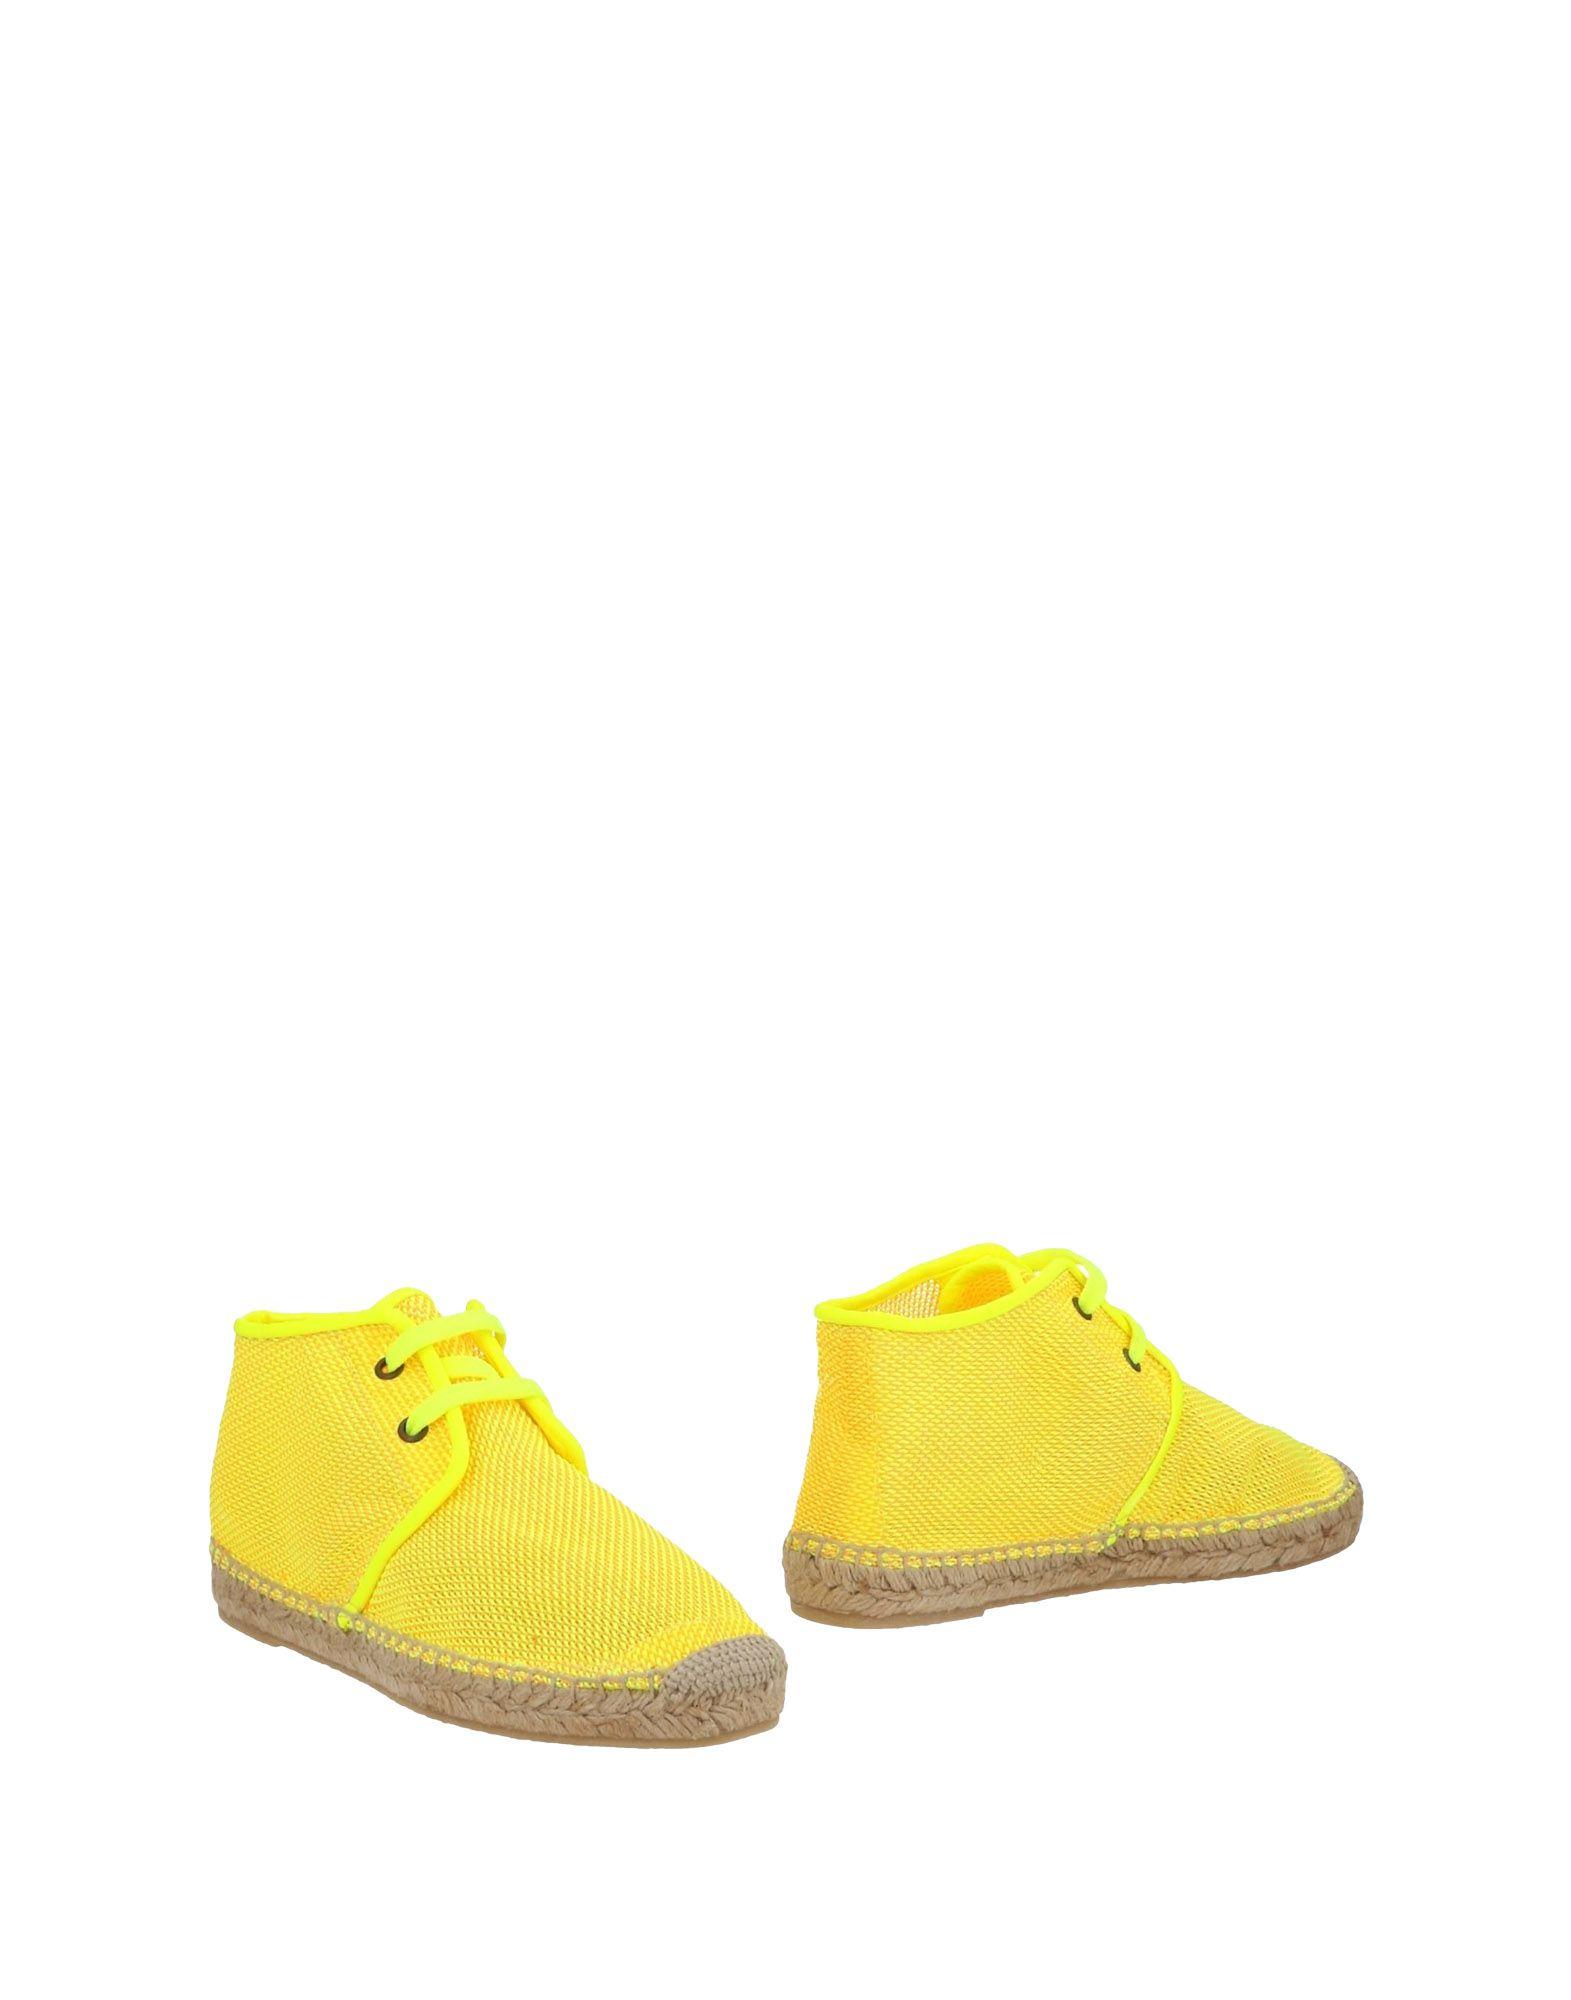 Stella Mccartney Stiefelette Damen  Schuhe 11484498FJGünstige gut aussehende Schuhe  0e7f90